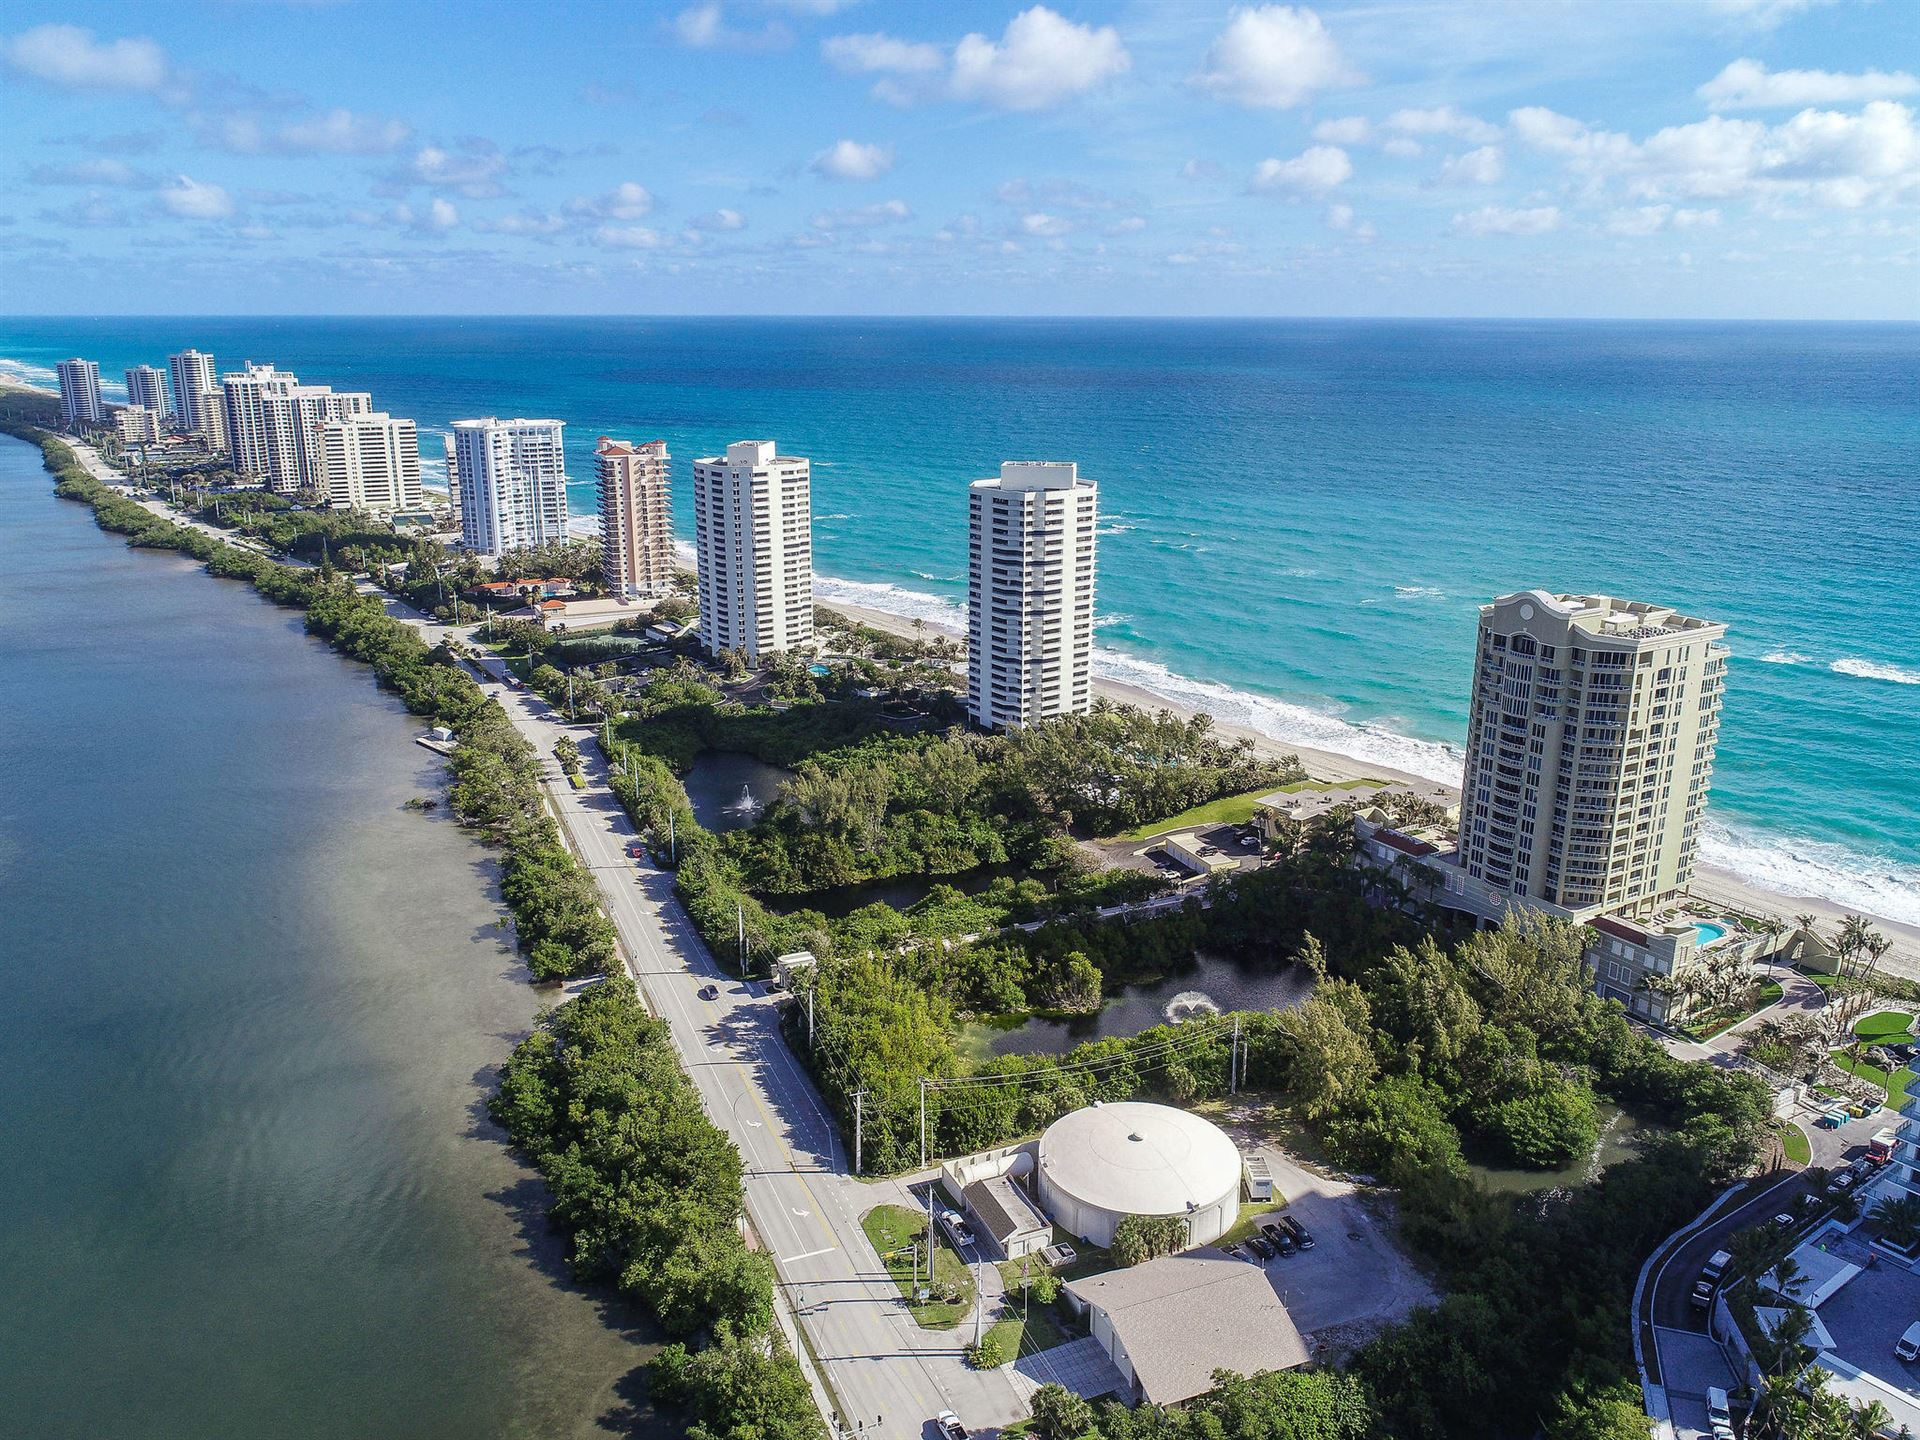 Photo of 5050 N Ocean Drive #403, Riviera Beach, FL 33404 (MLS # RX-10695234)